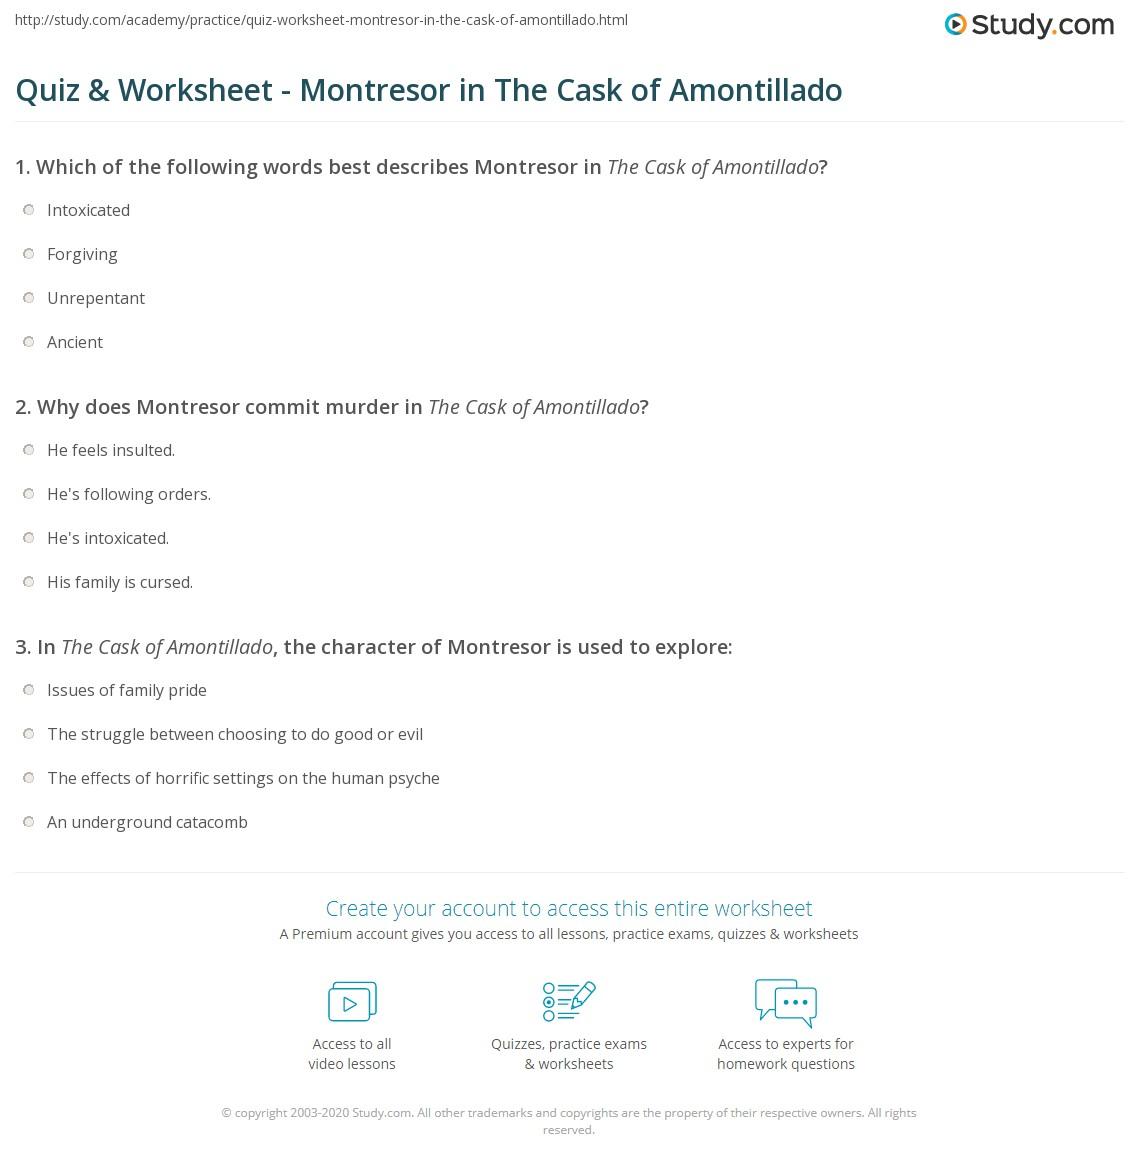 quiz worksheet montresor in the cask of amontillado. Black Bedroom Furniture Sets. Home Design Ideas